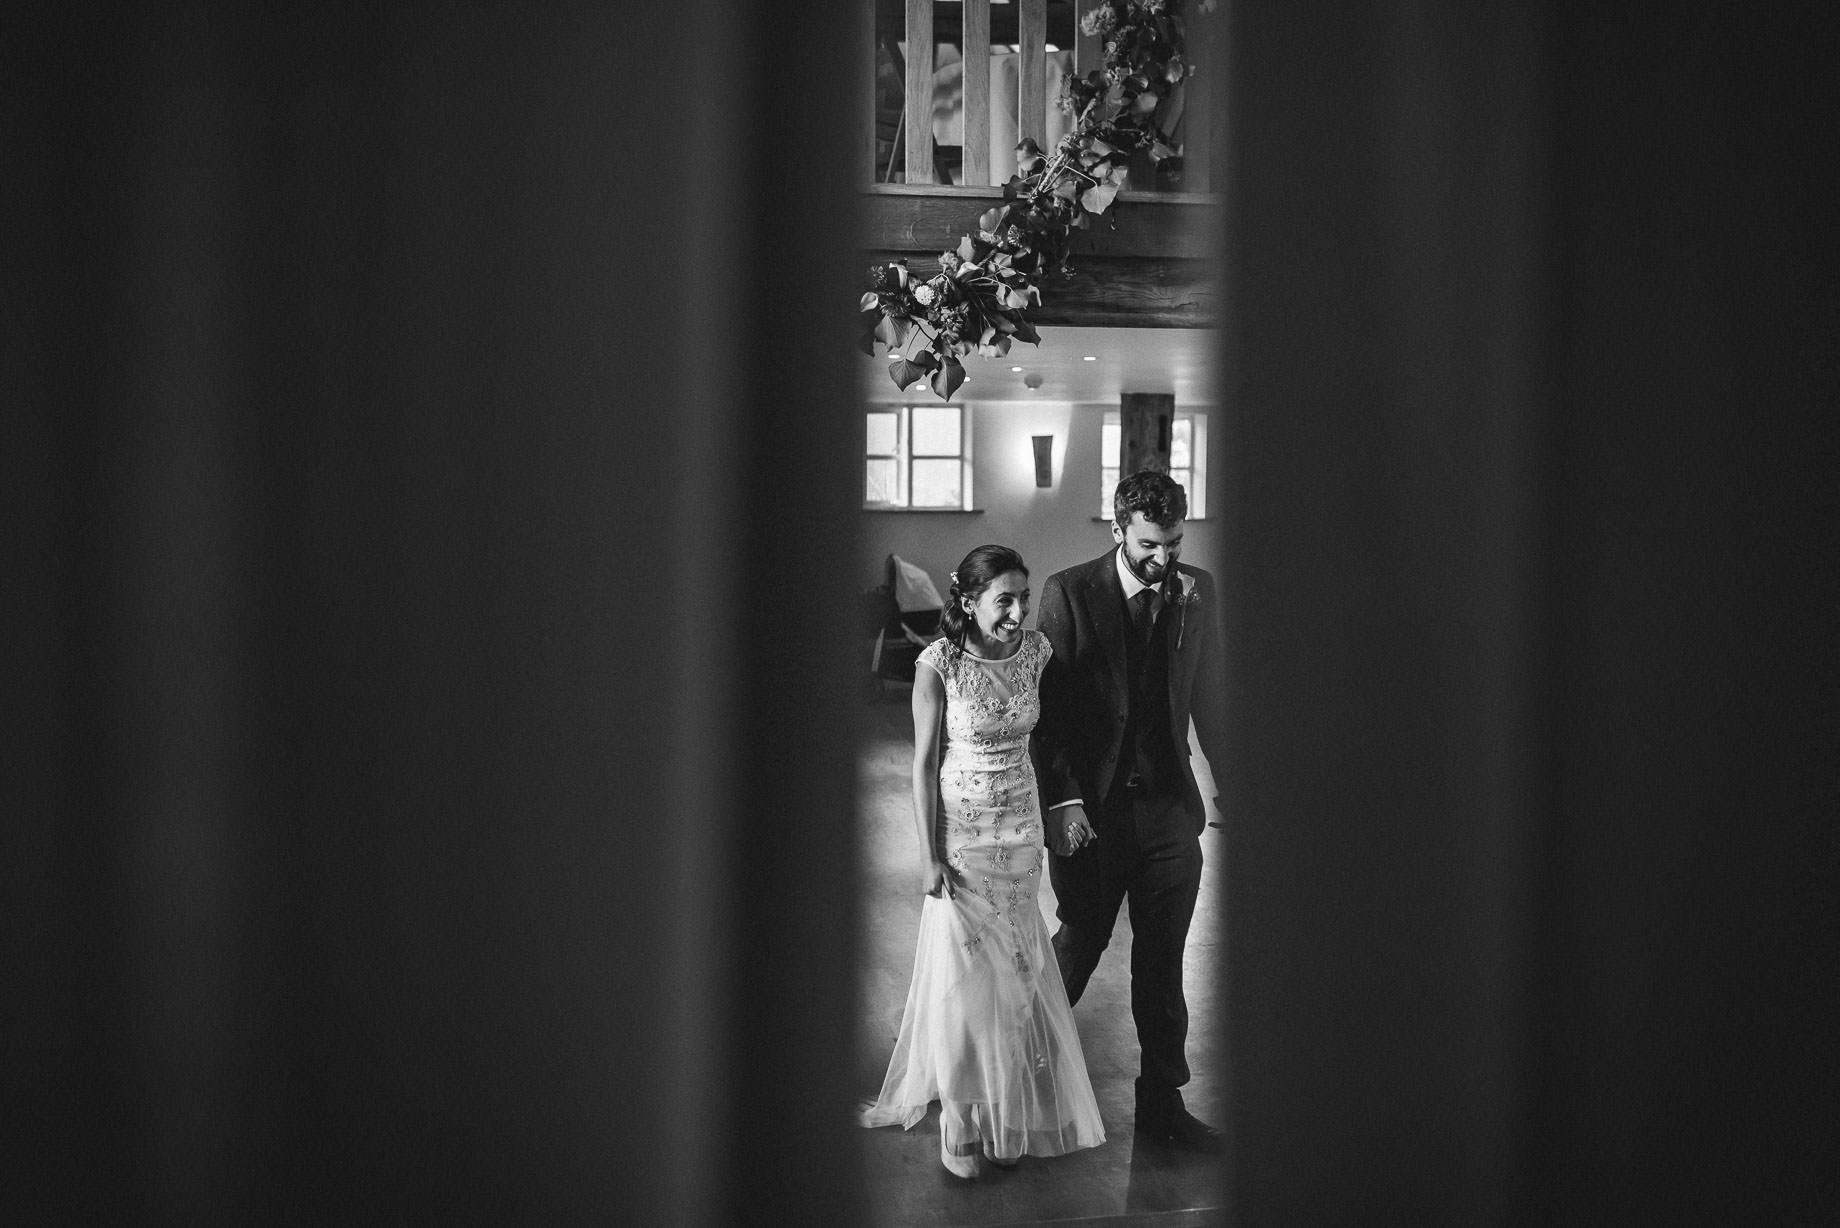 bury-court-barn-wedding-photography-guy-collier-photography-nadia-tom-140-of-184